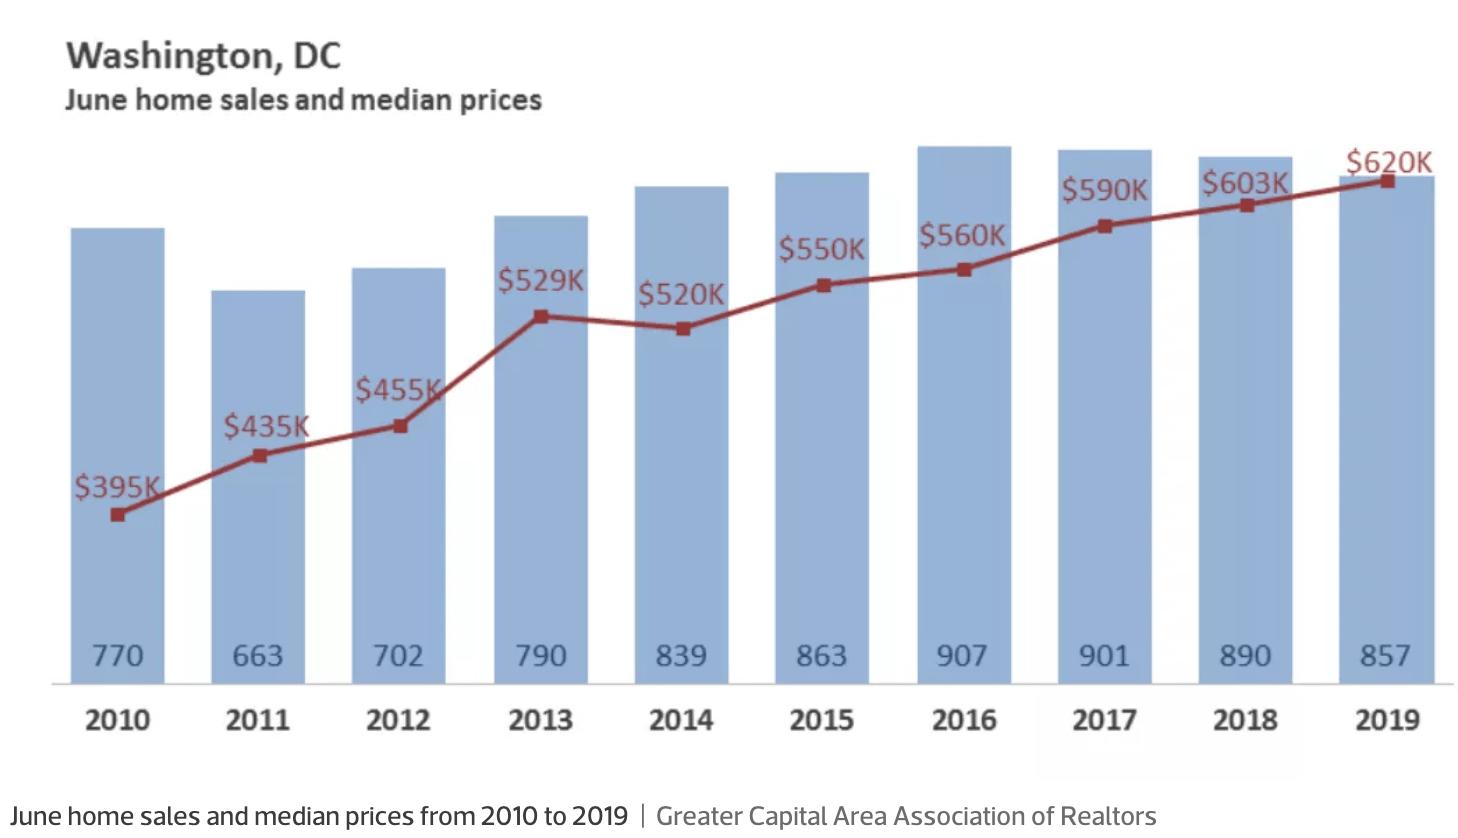 Washington D.C. median home price